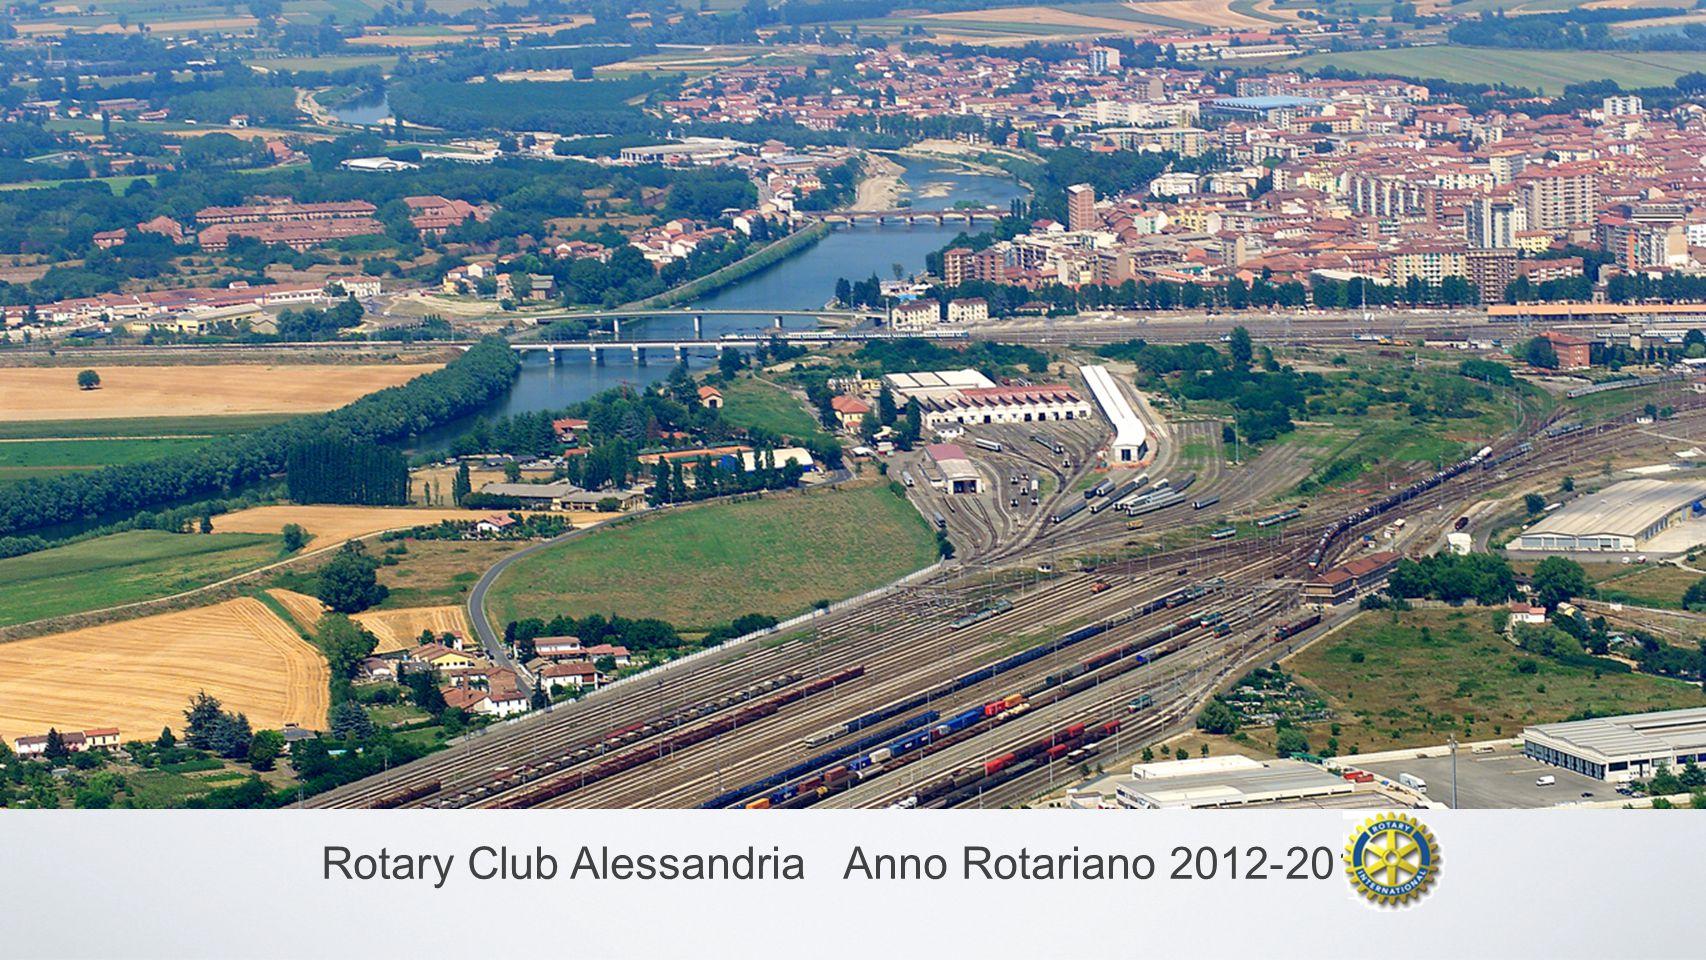 Rotary Club Alessandria Anno Rotariano 2012-2013